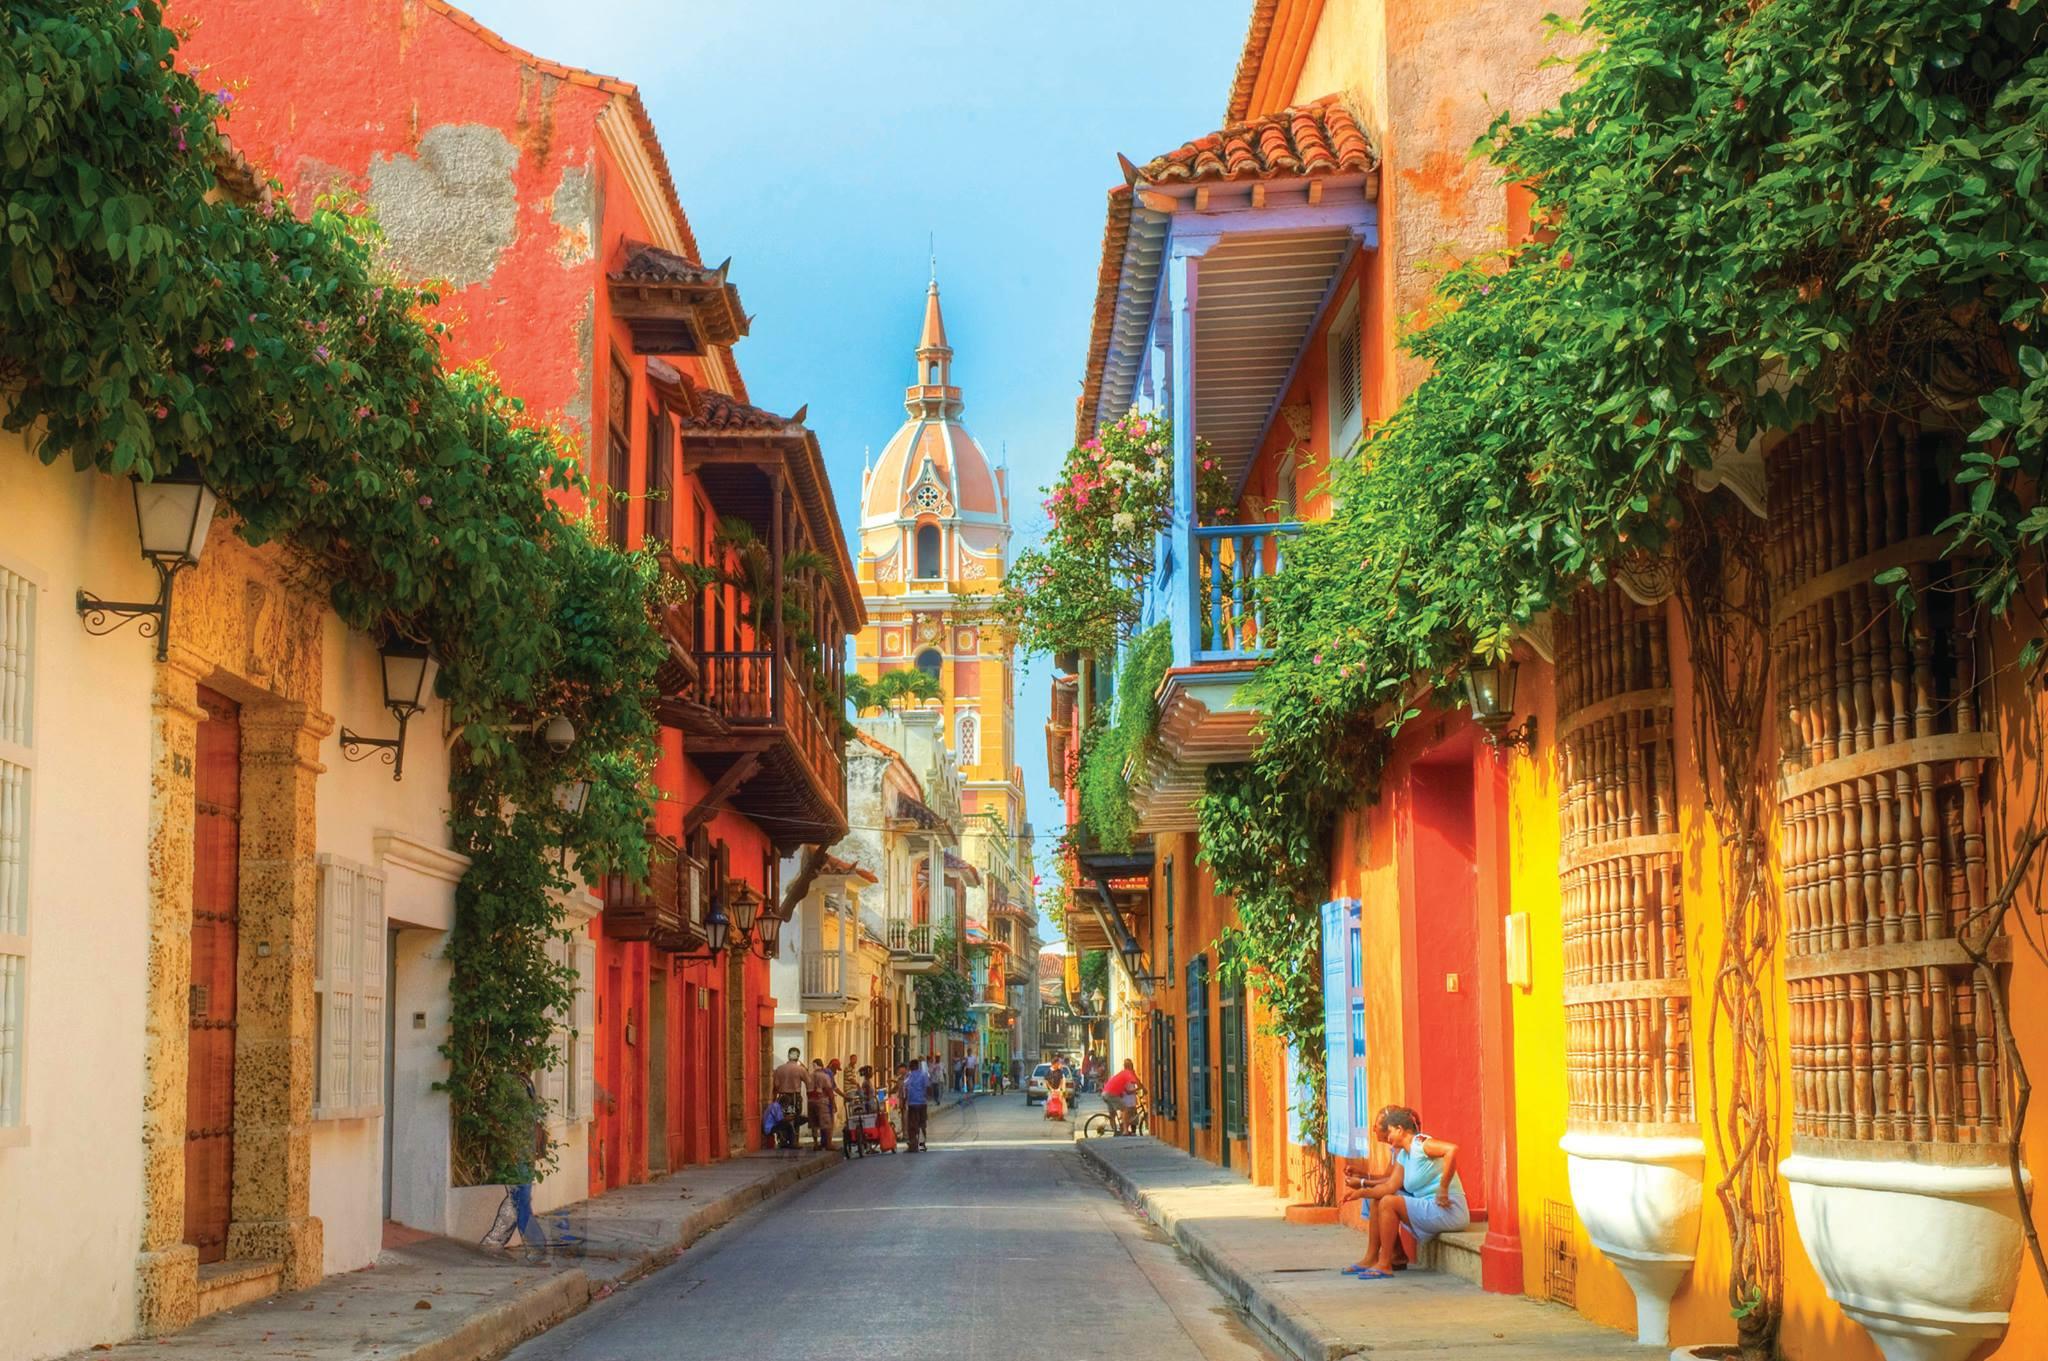 Cartagena Wallpapers Hd